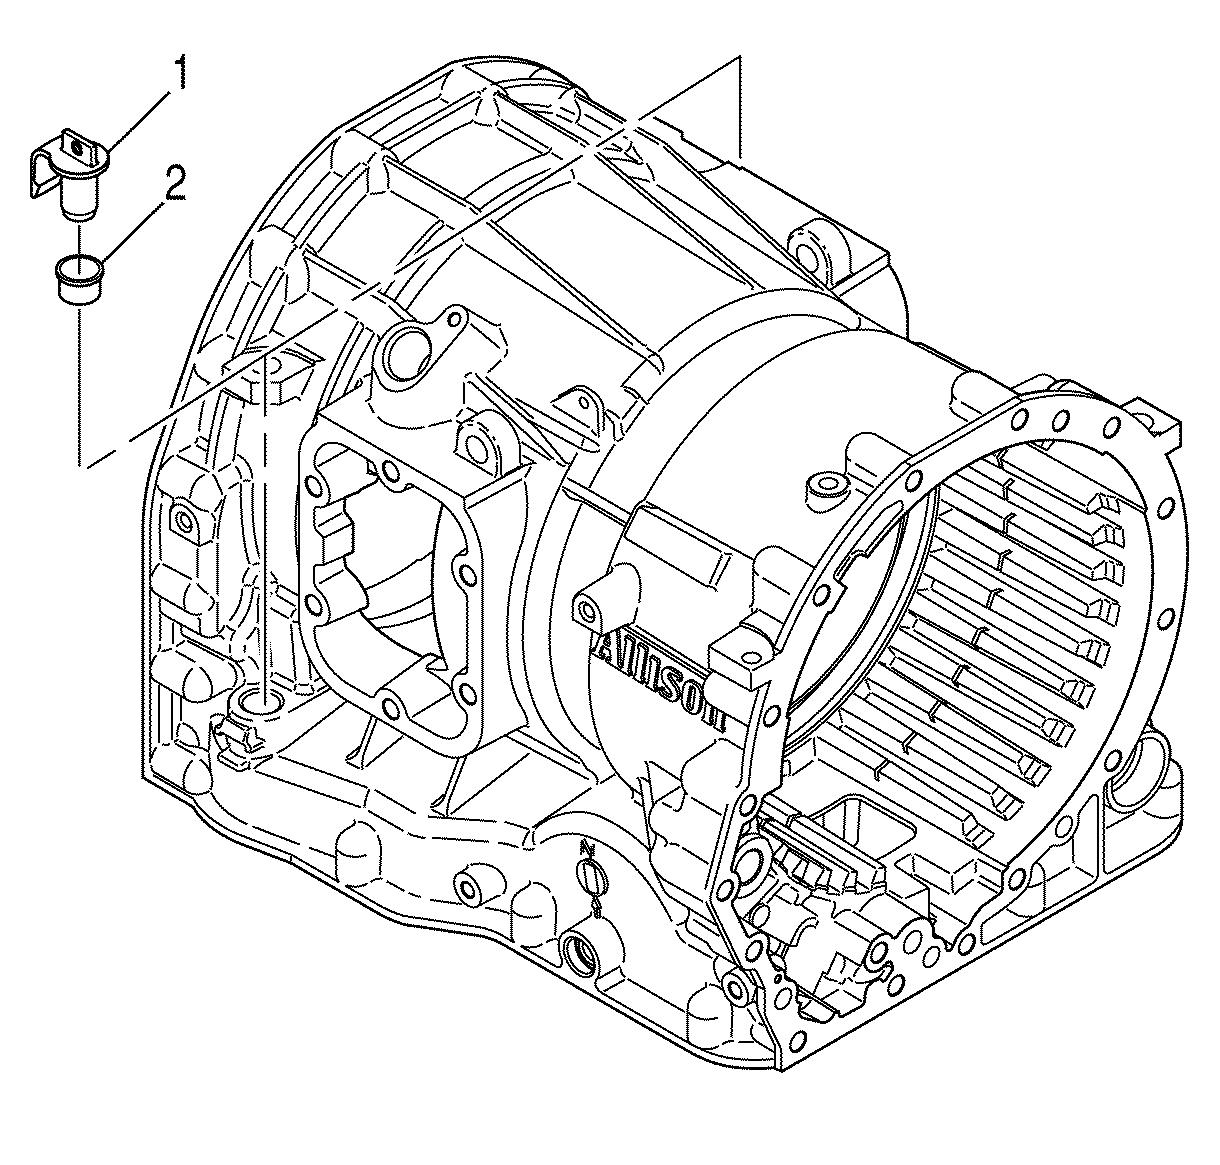 Transmission Drawing At Getdrawings